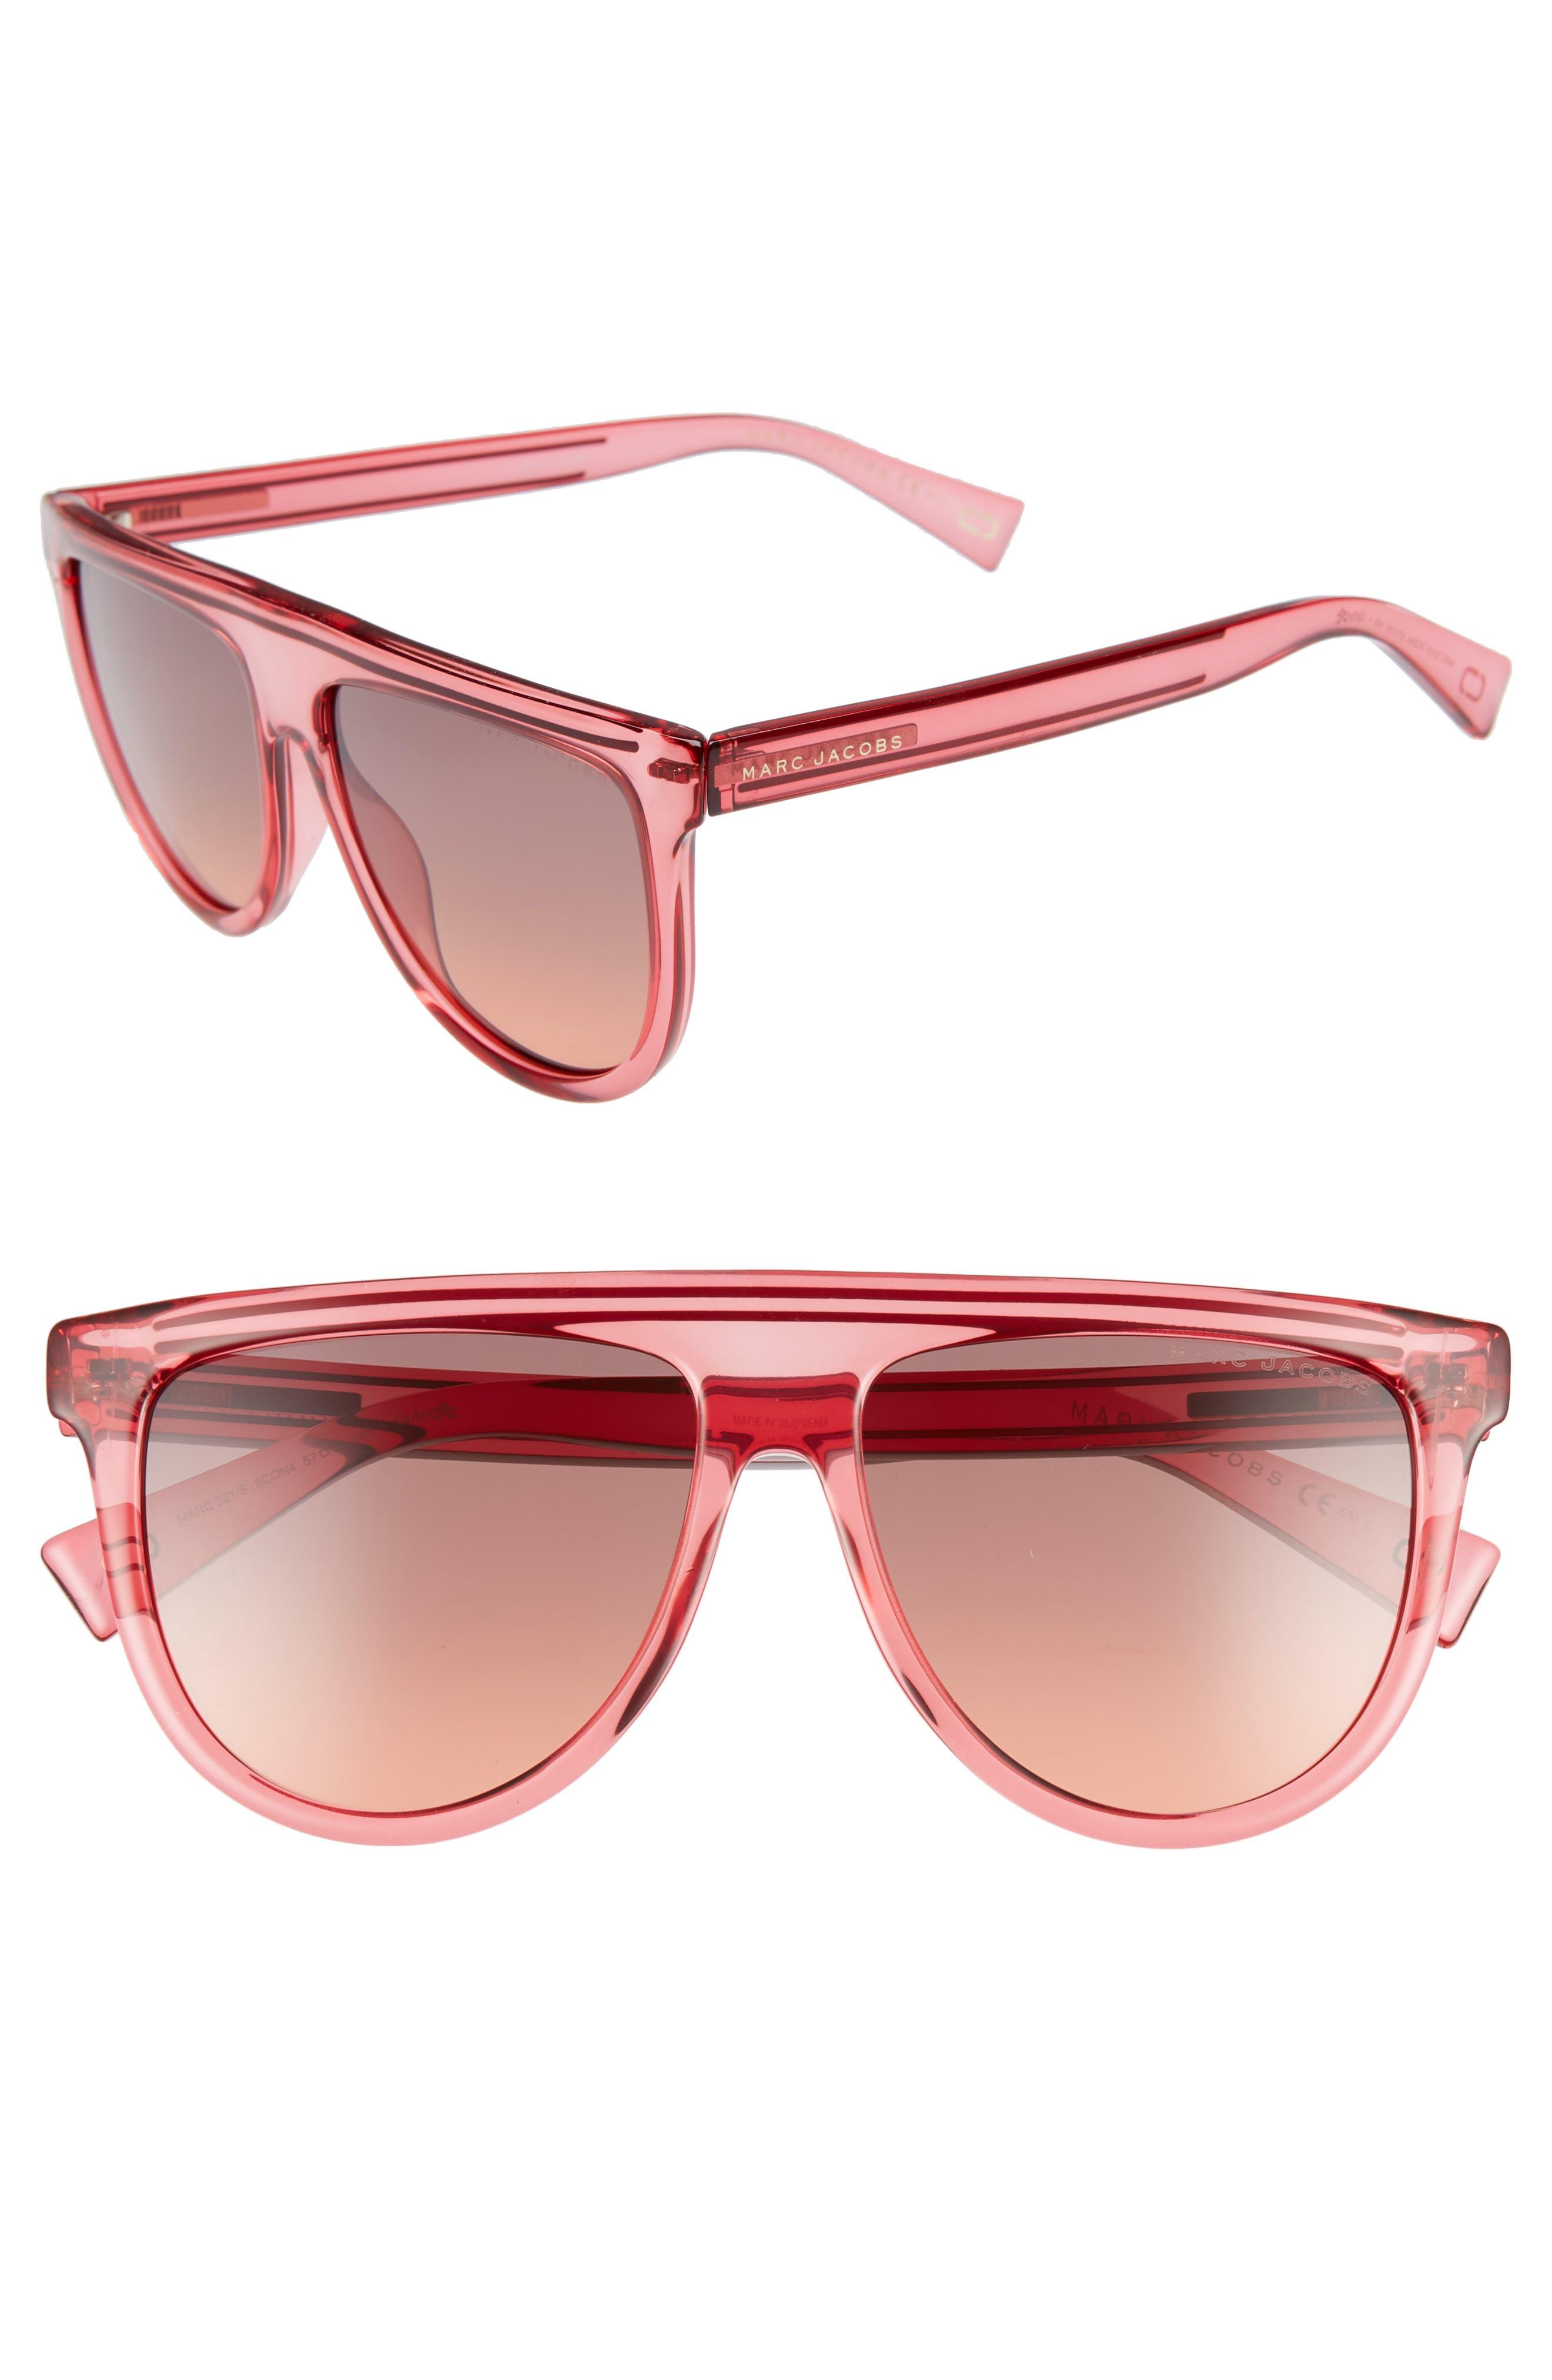 57Mm Gradient Flat Top Sunglasses - Cherry